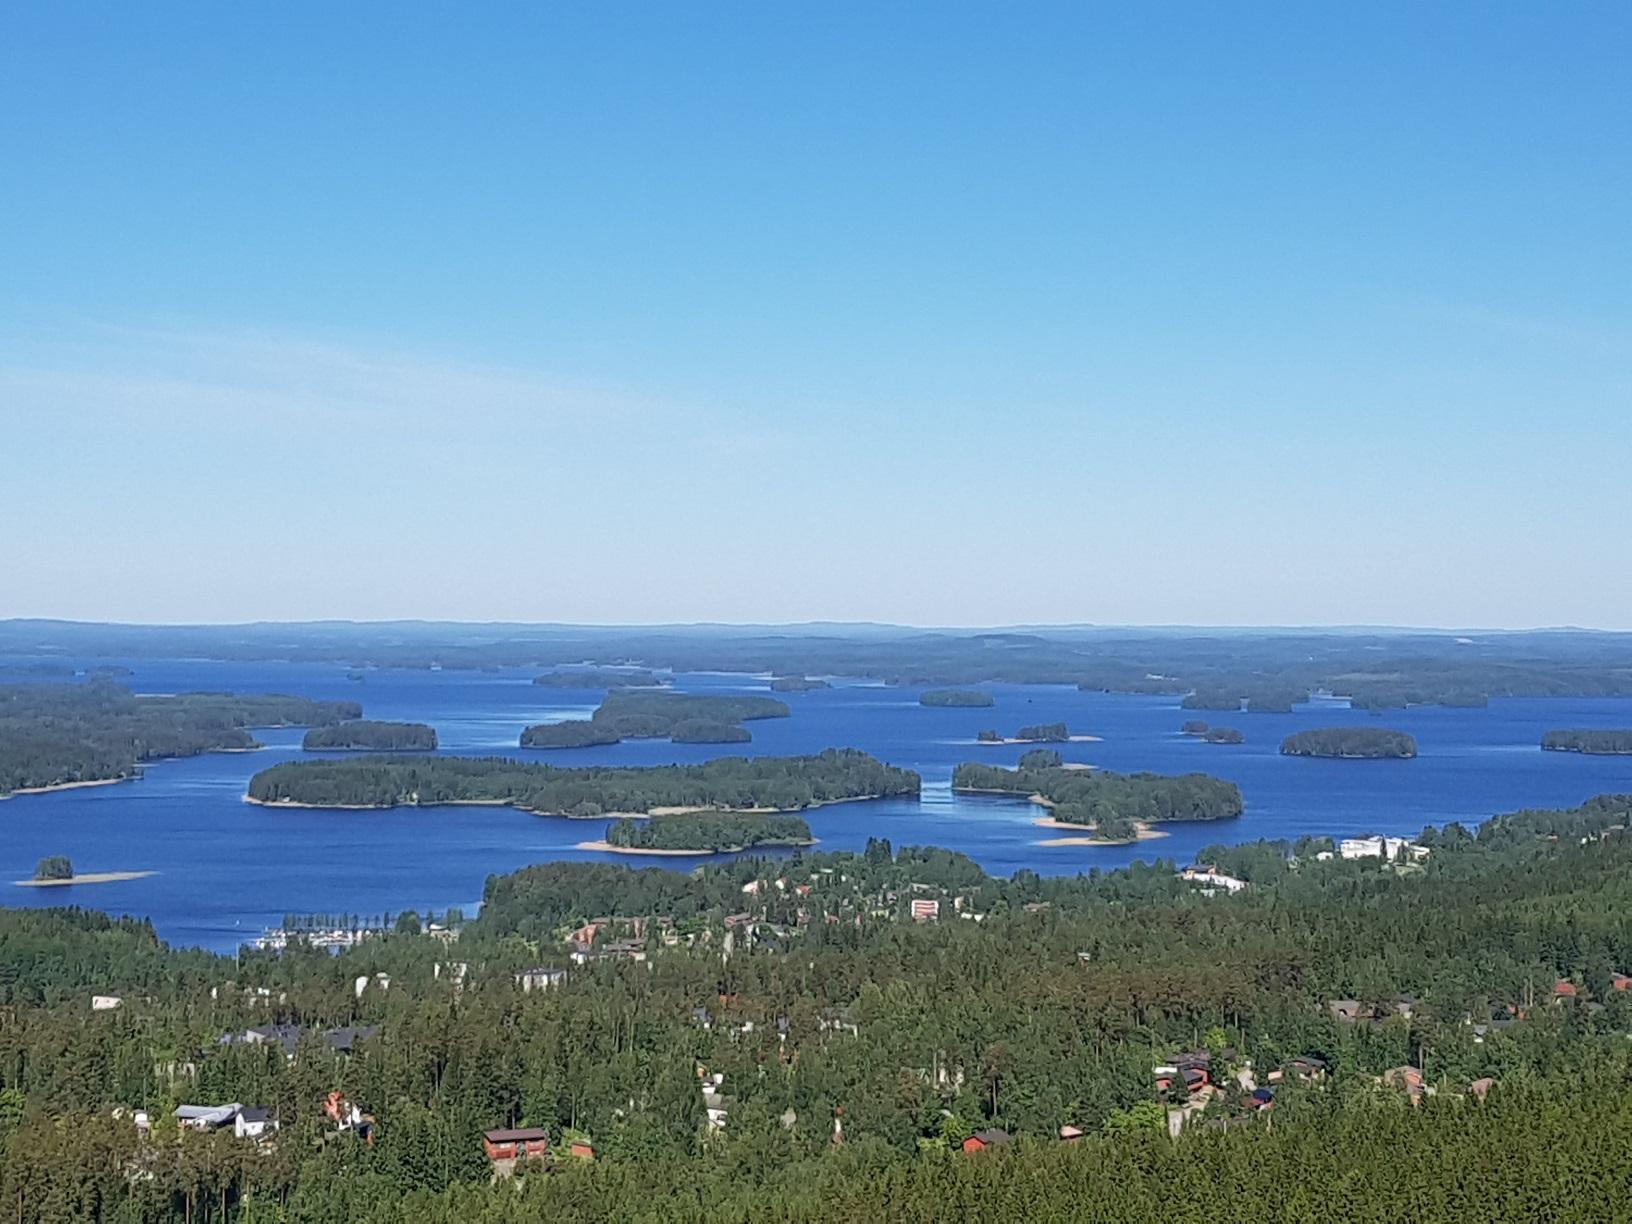 Kuopio Puijon torni